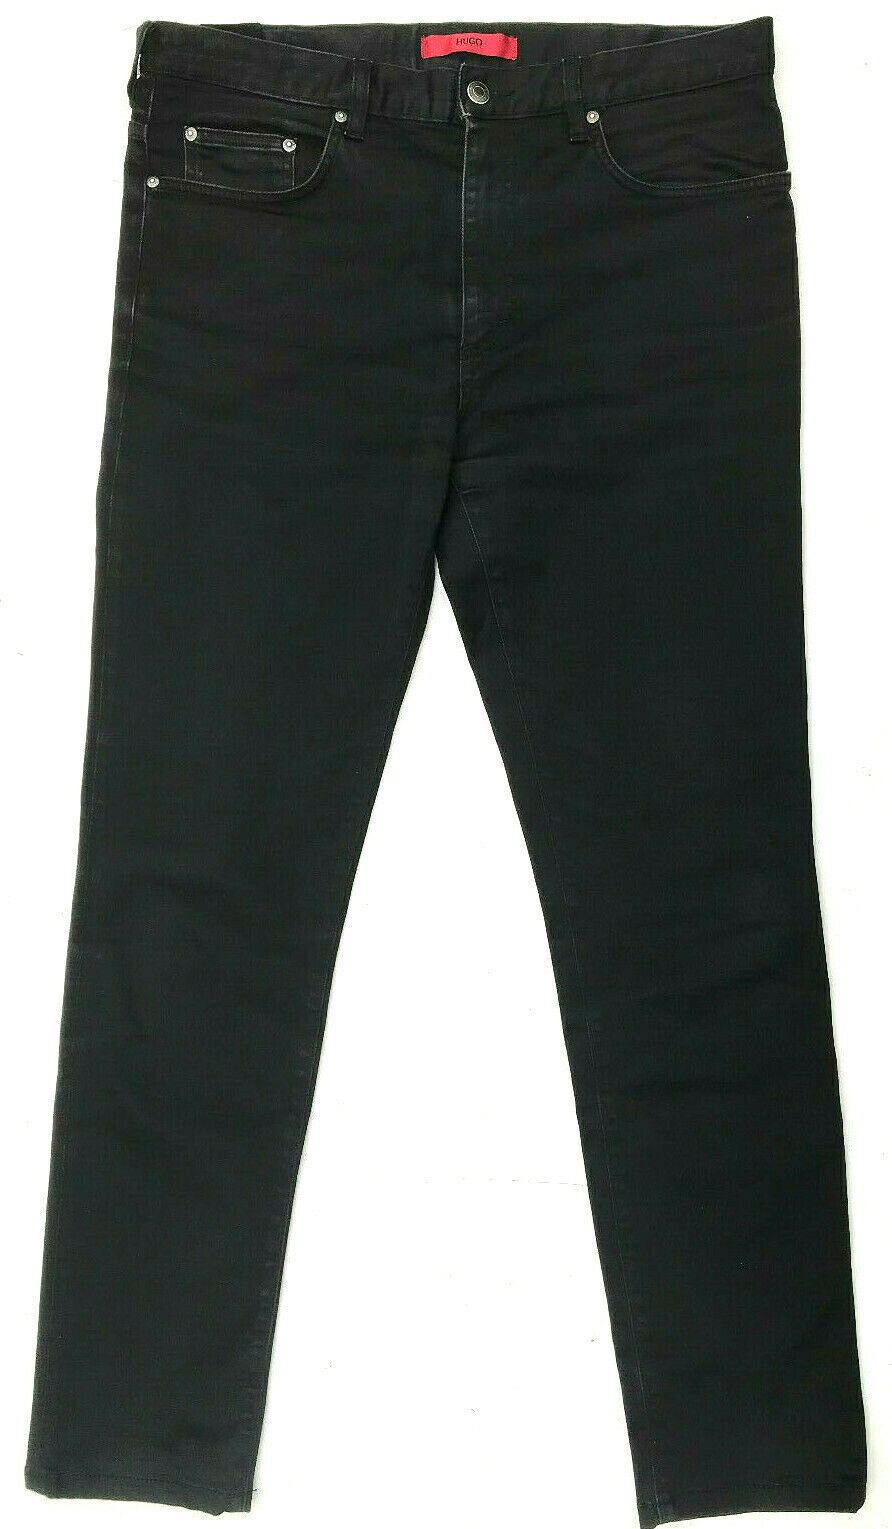 "Mens Jeans ""Hugo De Hugo Boss  021 2& 039; Negro Calce Regular Tamaño W34 L32  compras de moda online"